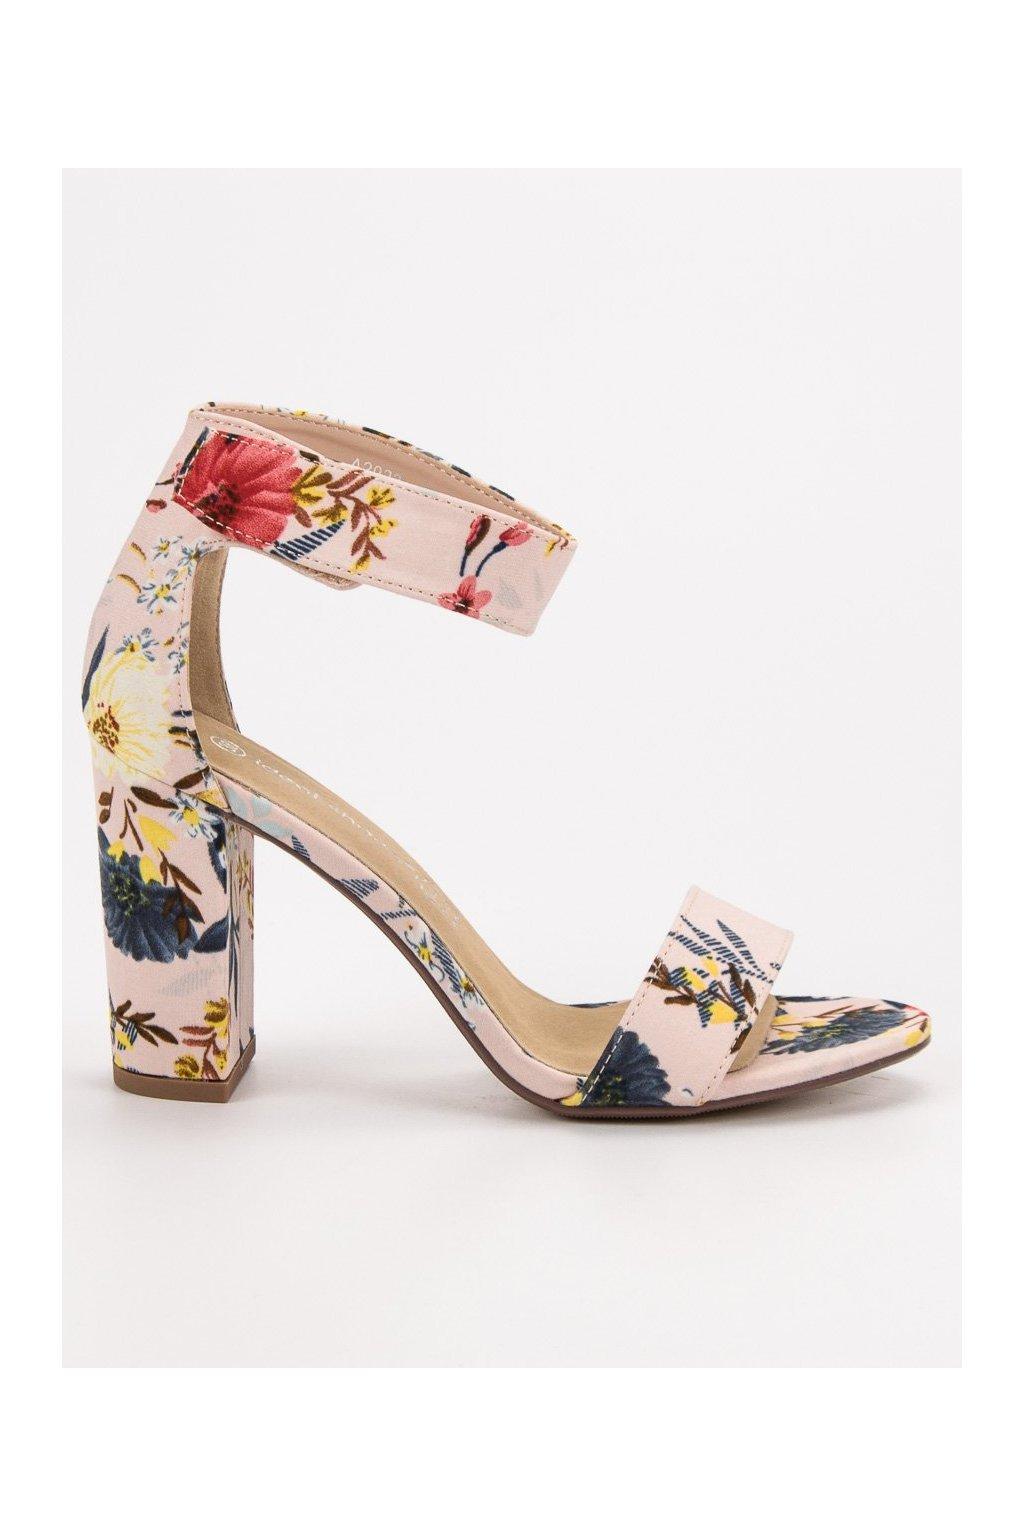 6a7953e2f43b Ružové dámske sandále na stĺpiku Ideal shoes A2923FL